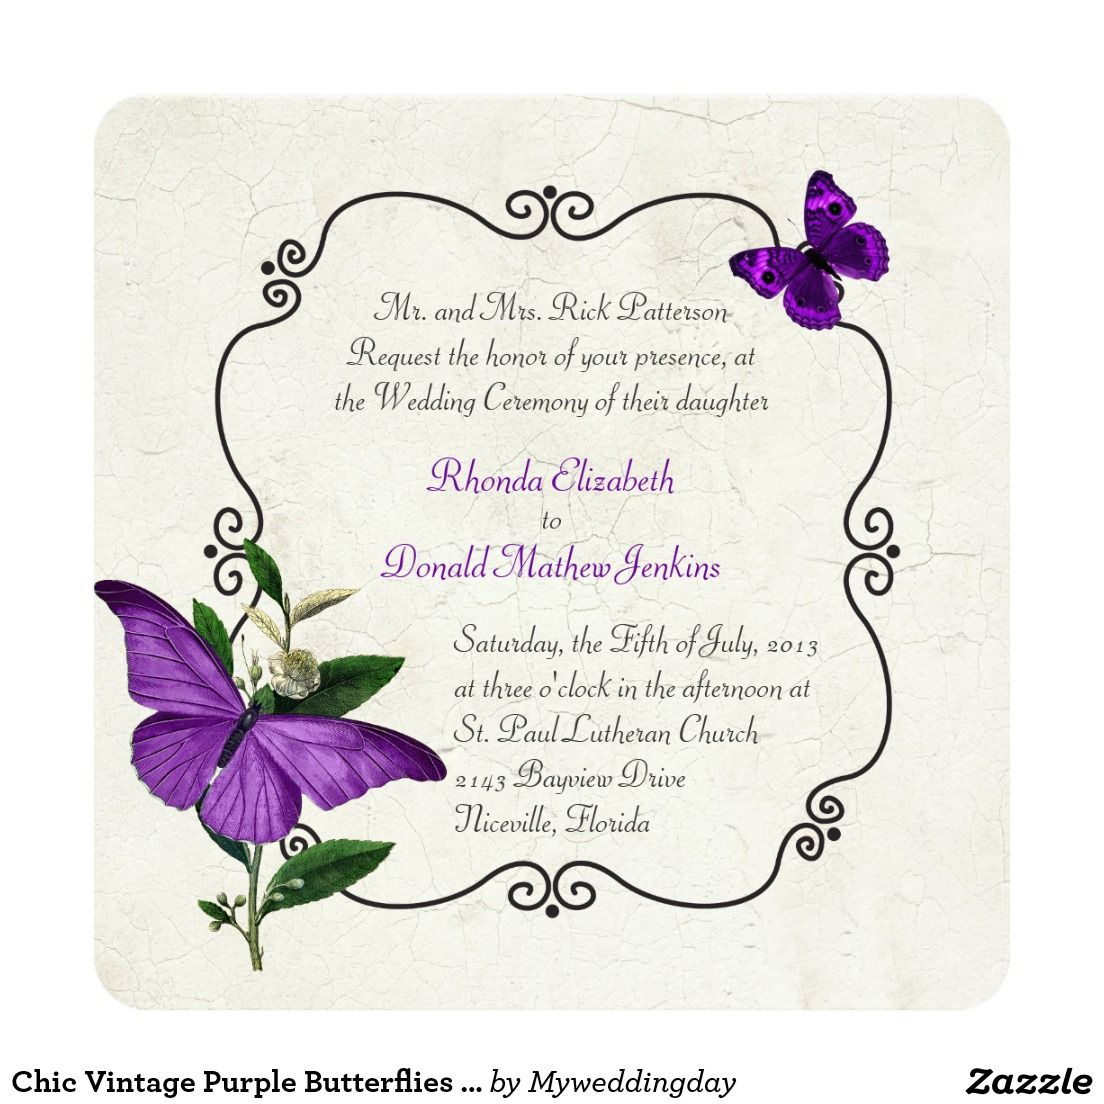 Chic Vintage Purple Butterflies Wedding Invitation   Vintage wedding ...